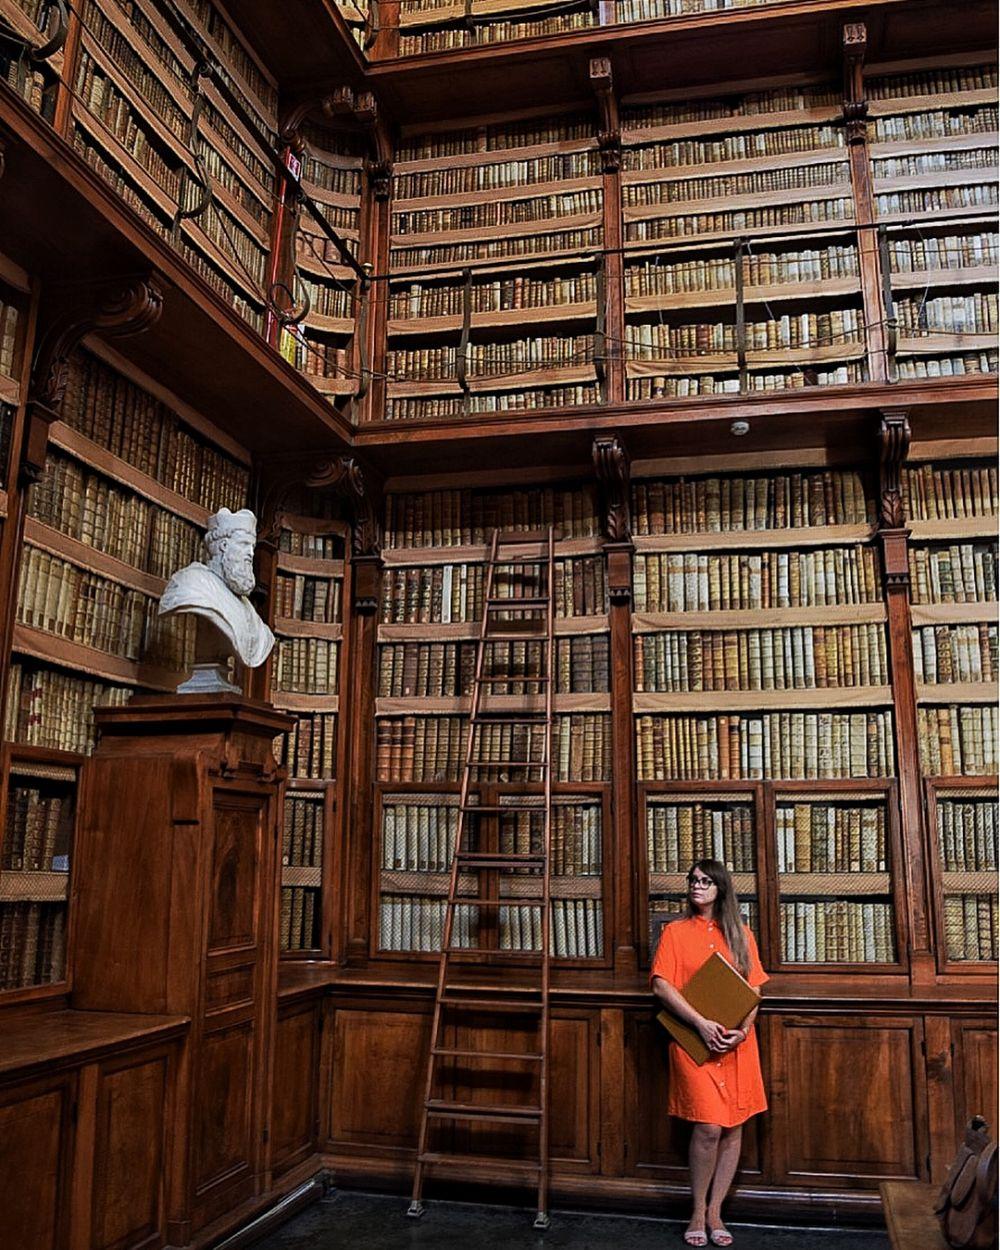 perpustakaan mirip hoghwarts © 2018 brilio.net berbagai sumber